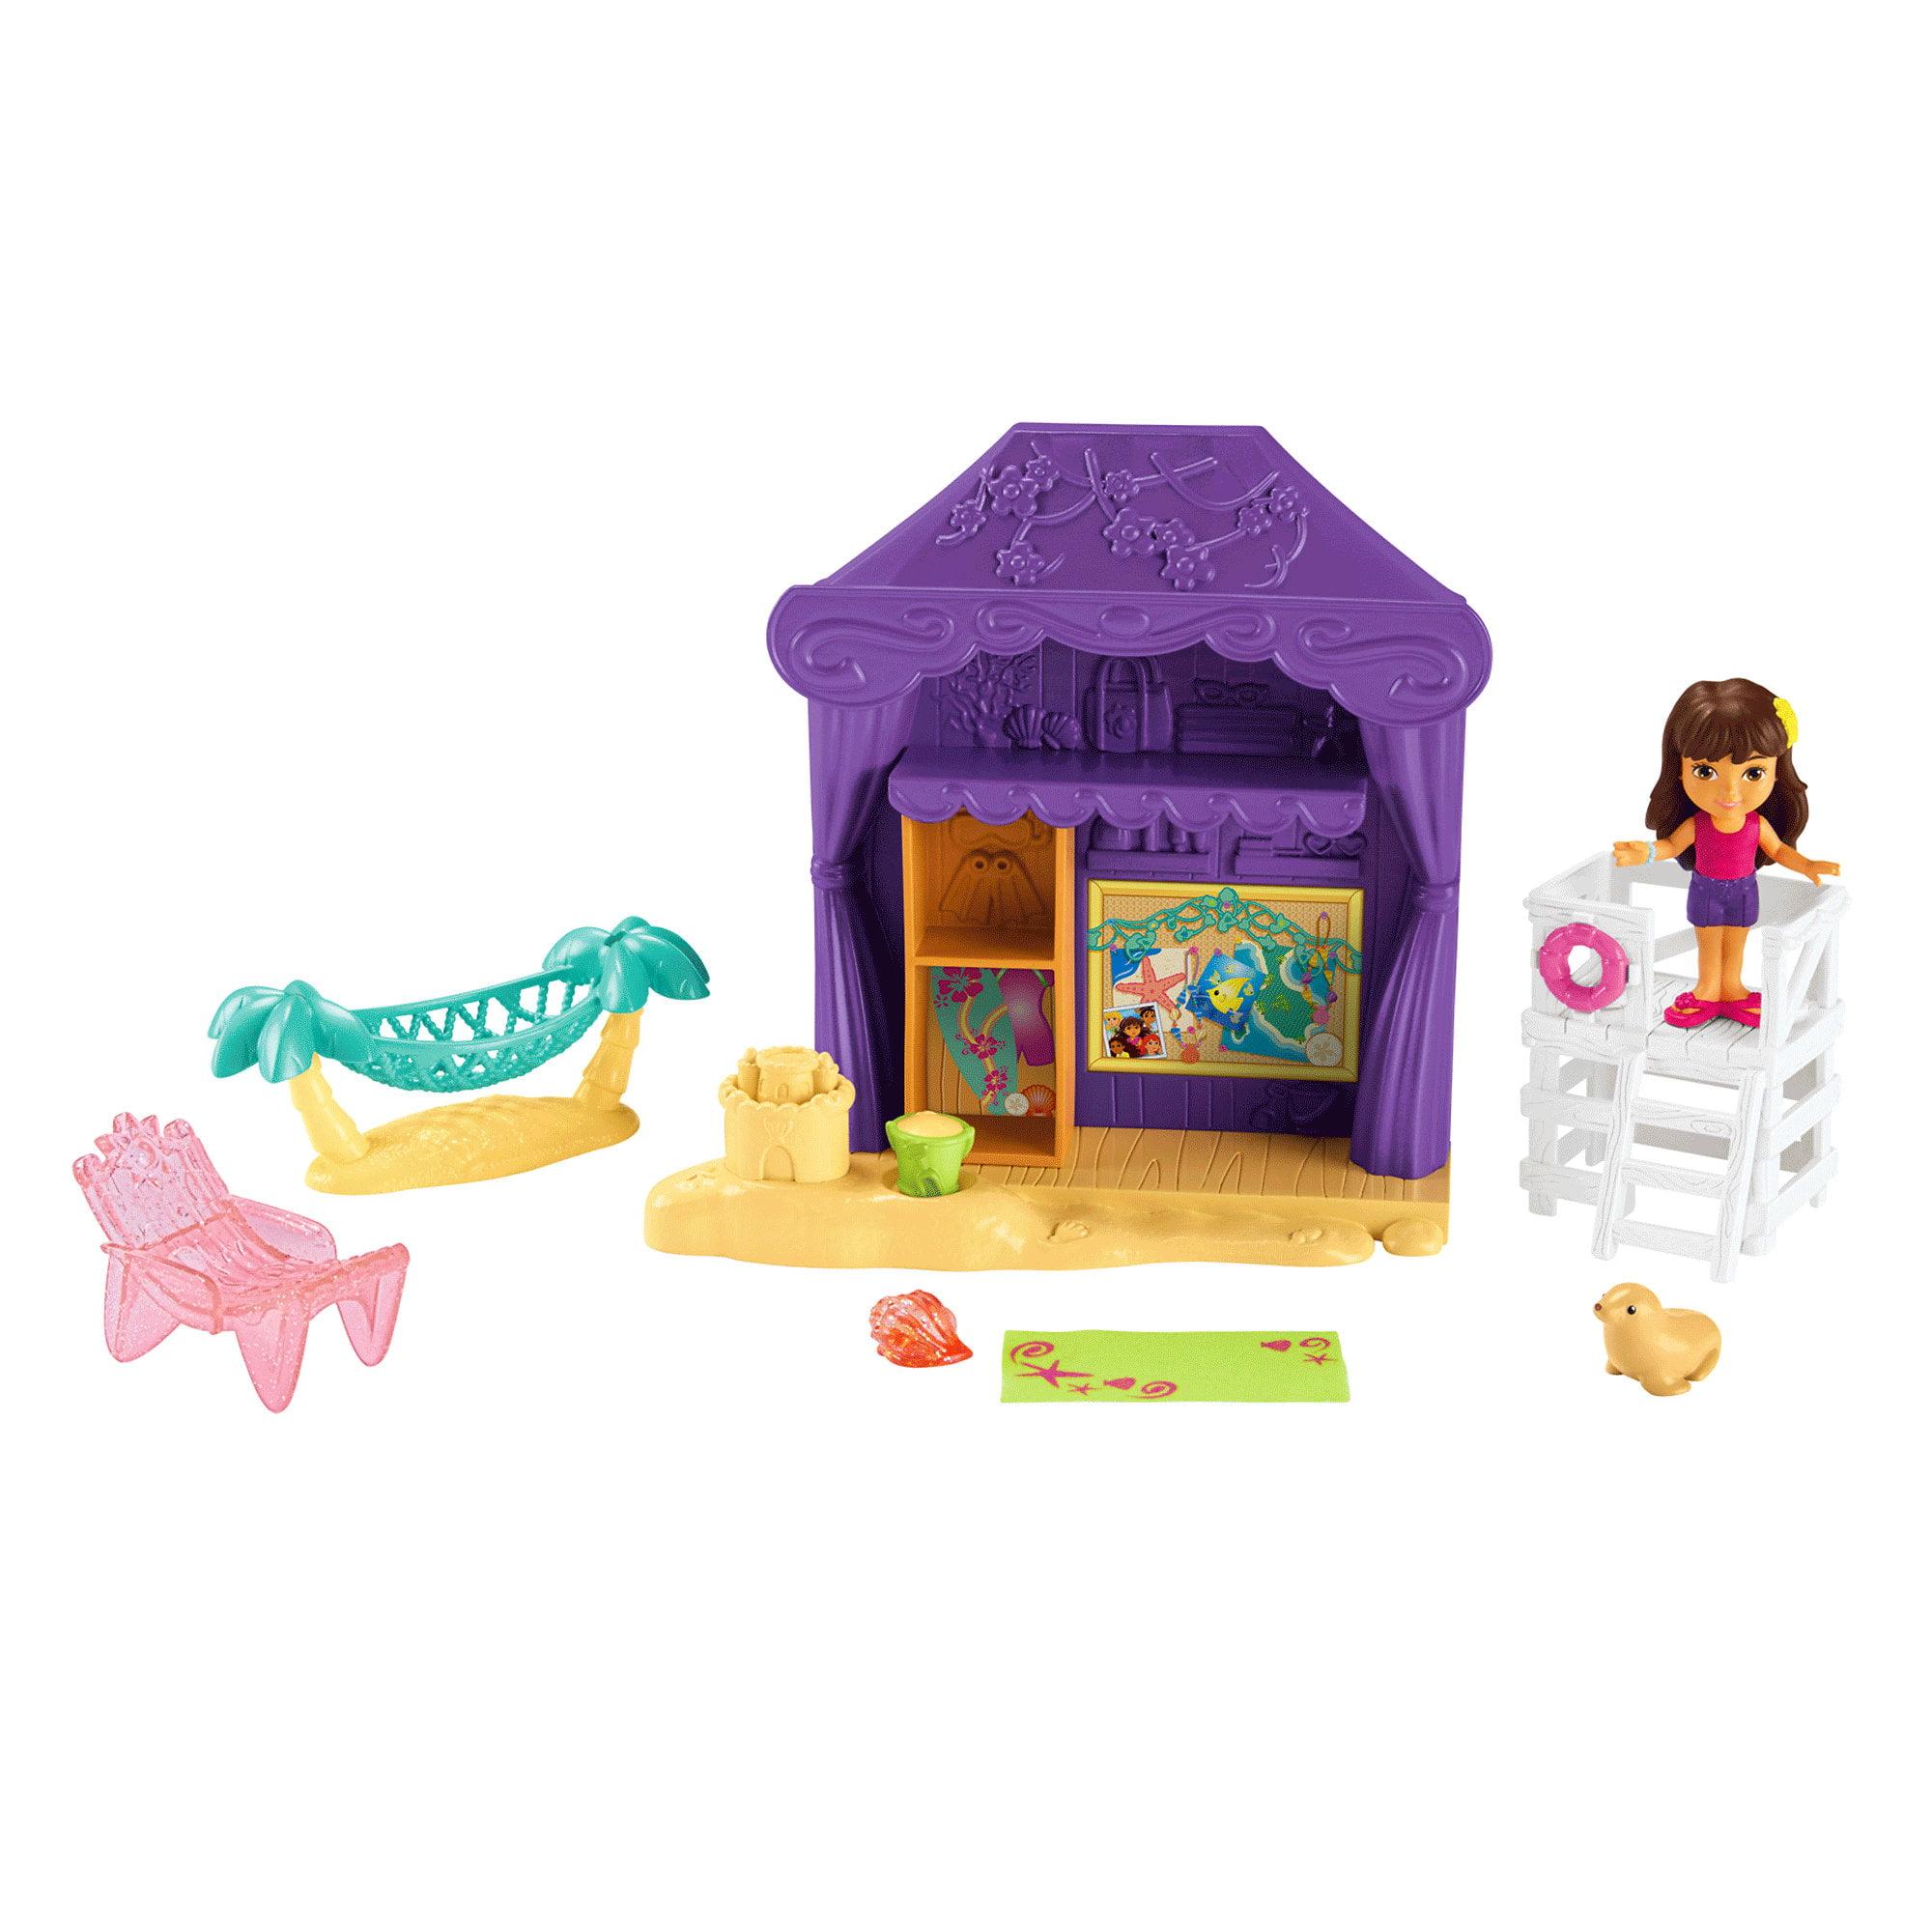 Fisher-Price Dora and Friends Playa Verda Cabana Playset - Walmart.com